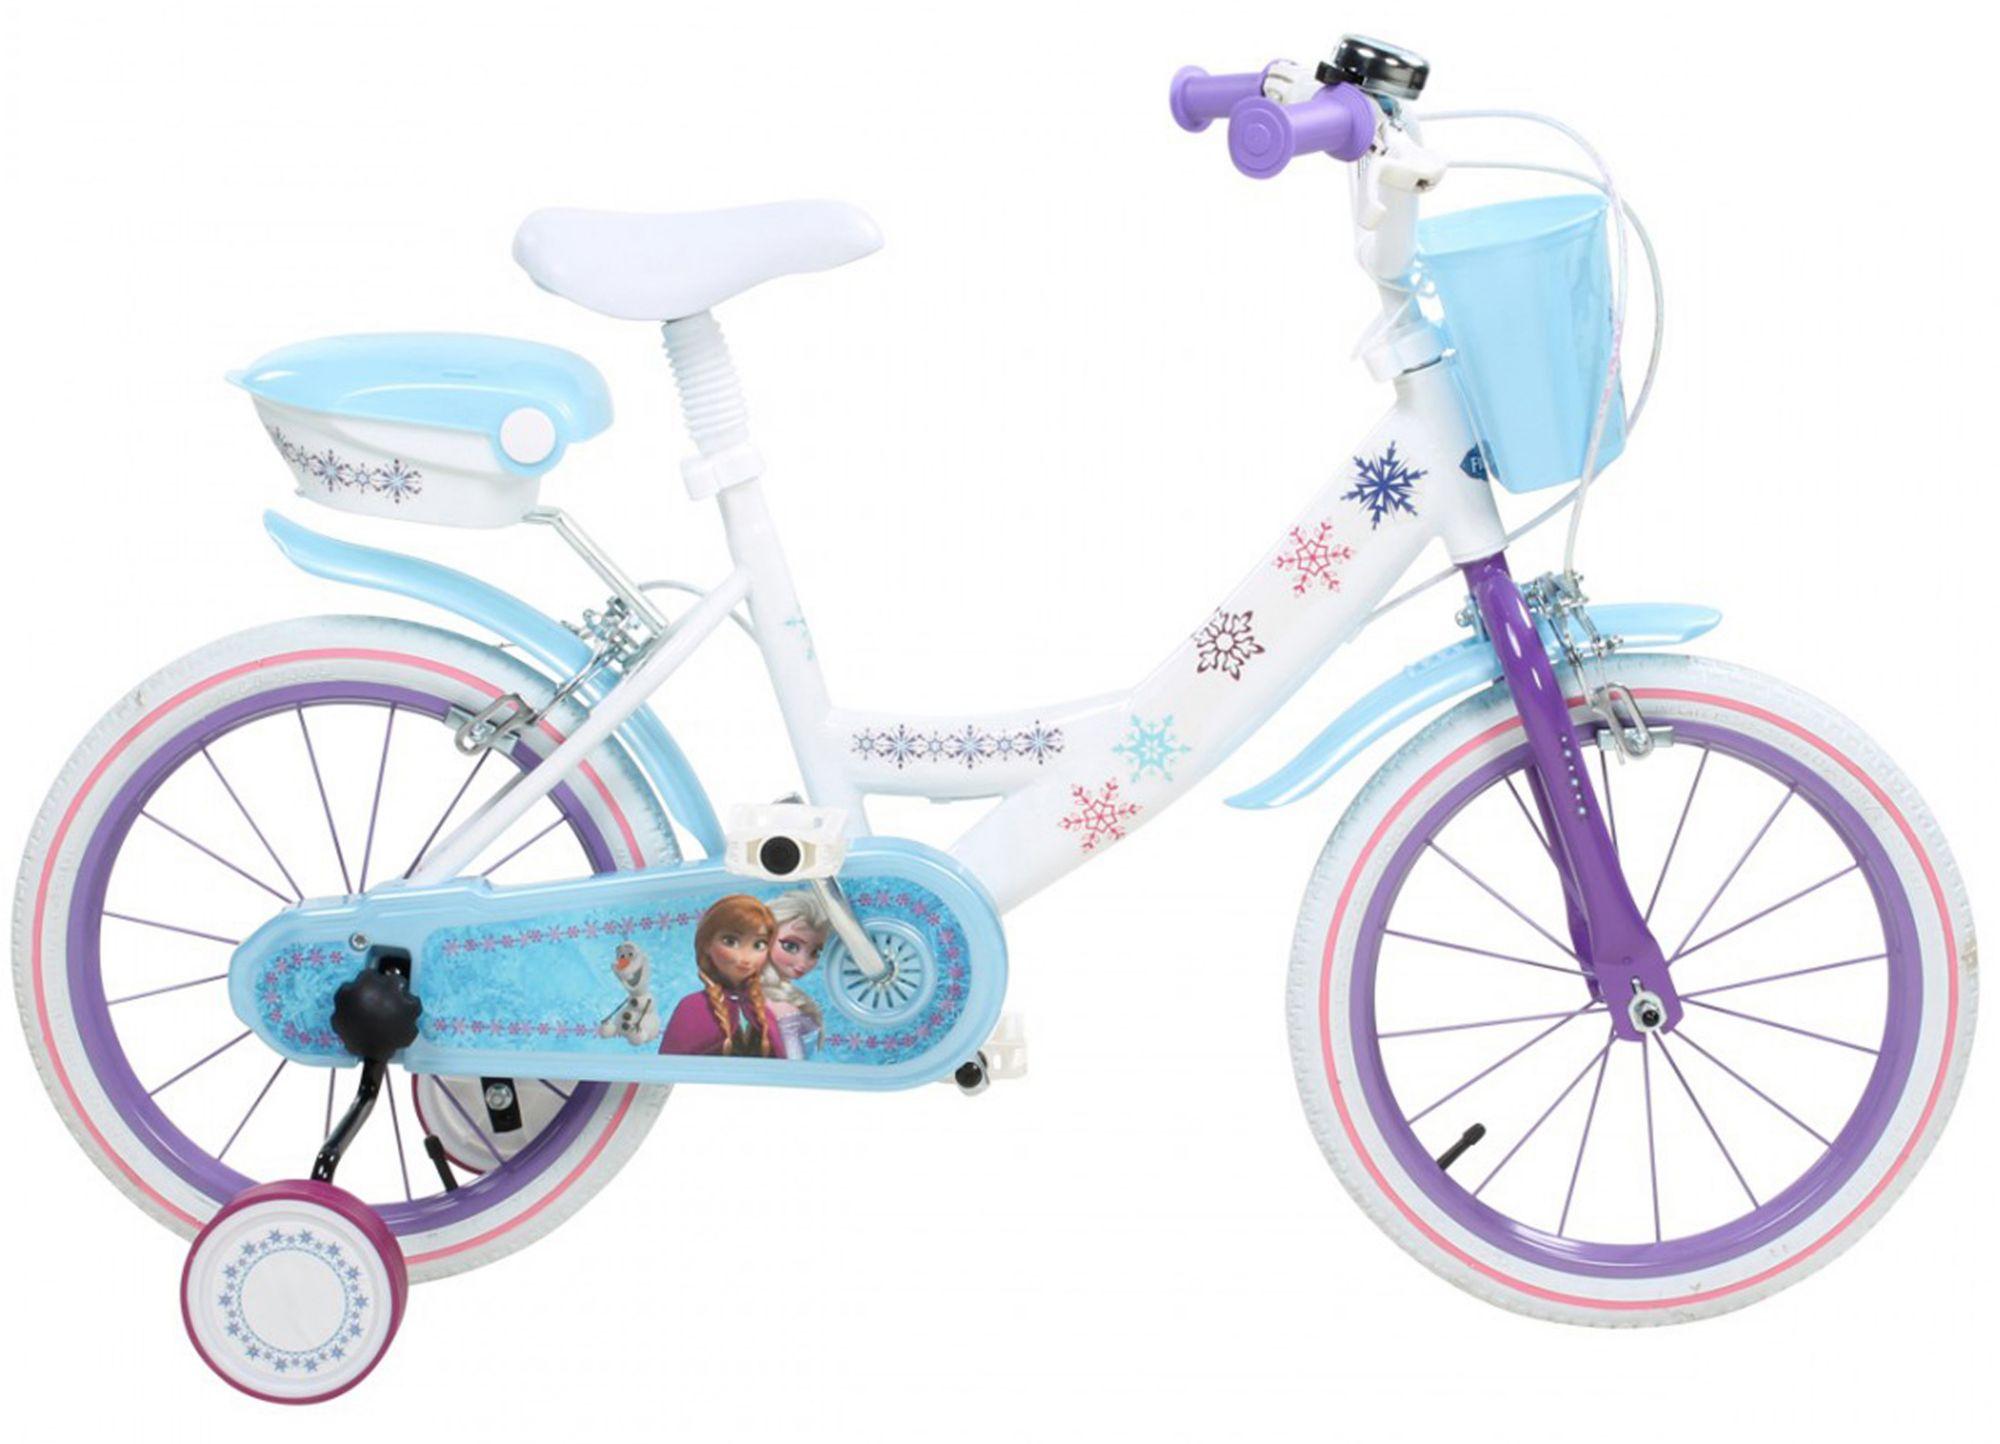 DISNEY Disney Kinderfahrrad Mädchen, 14 Zoll, U-Brakes, »Frozen«